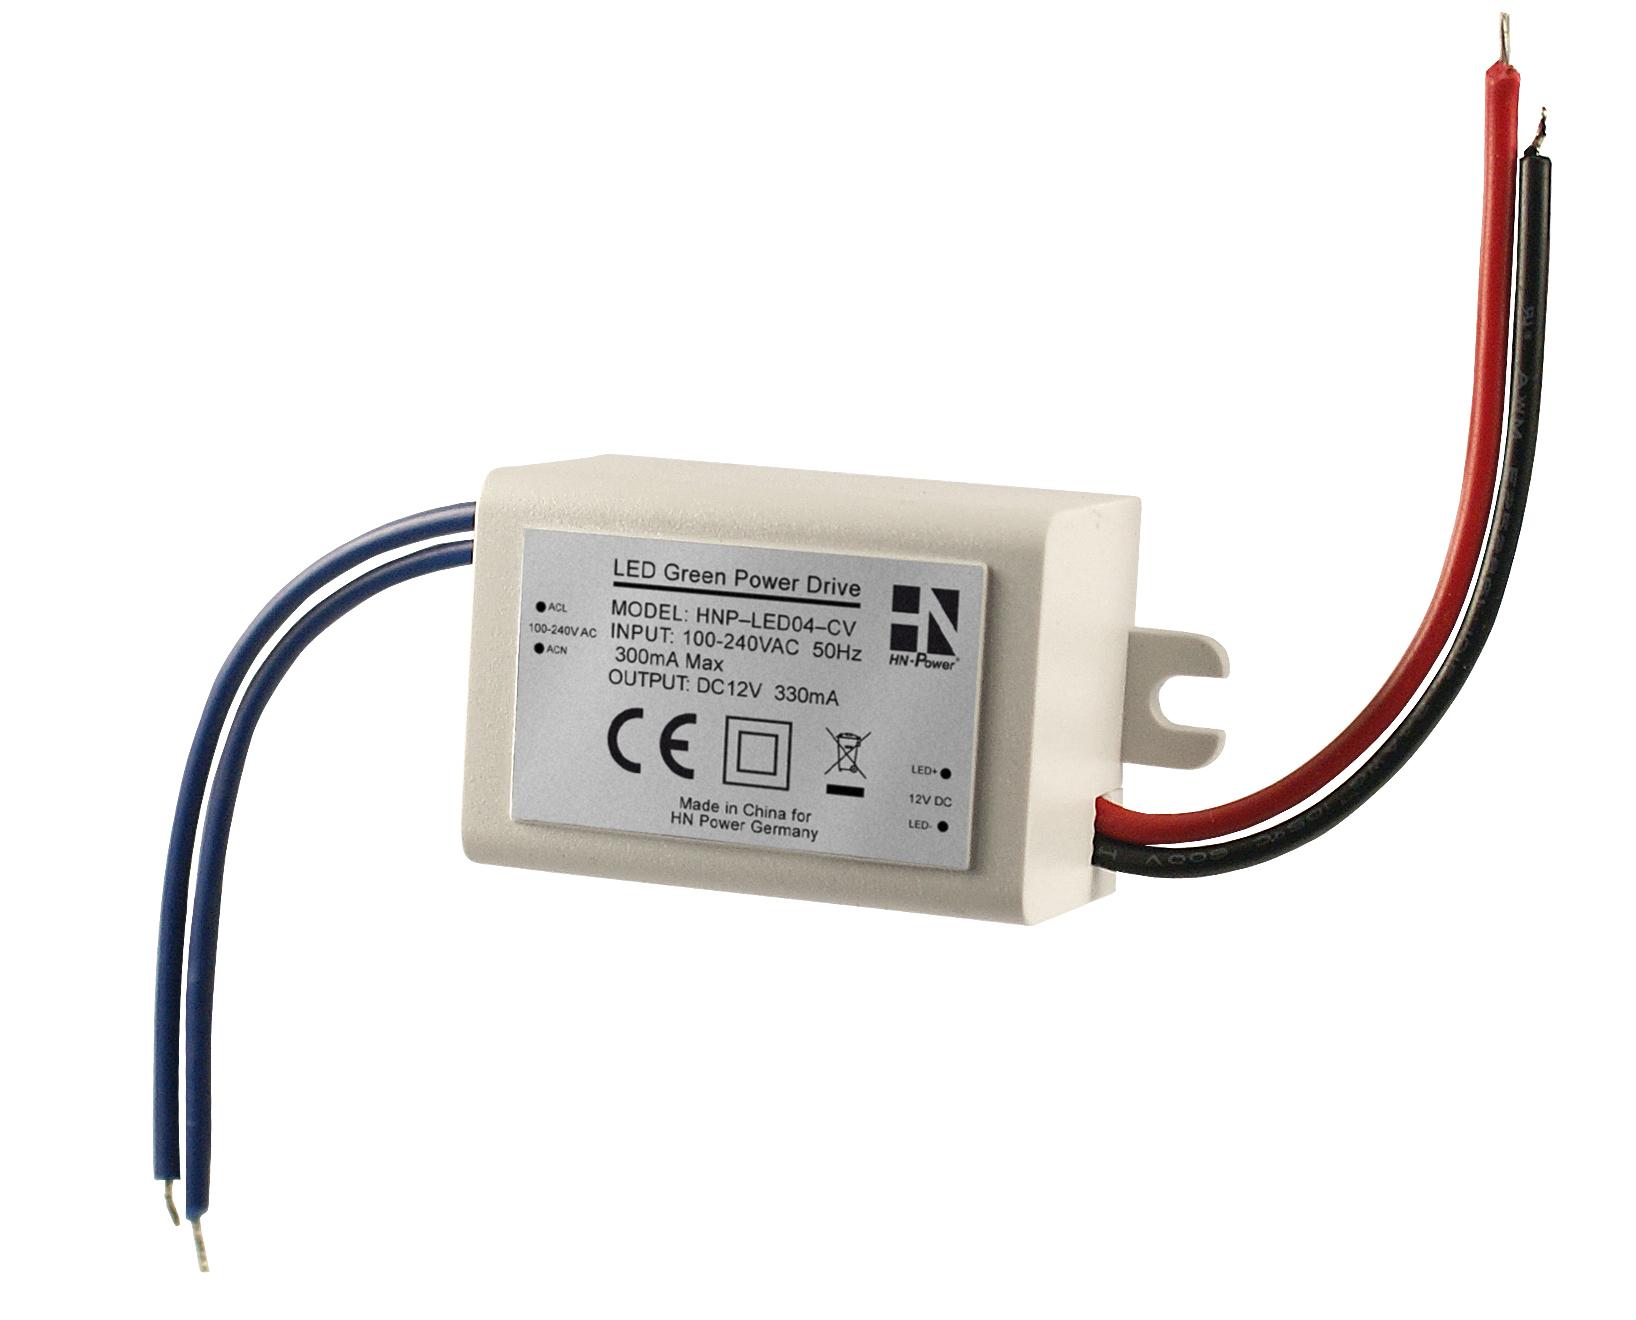 HNP-LED04-CV – LED driver 4 Watt CV – HN Electronic Components